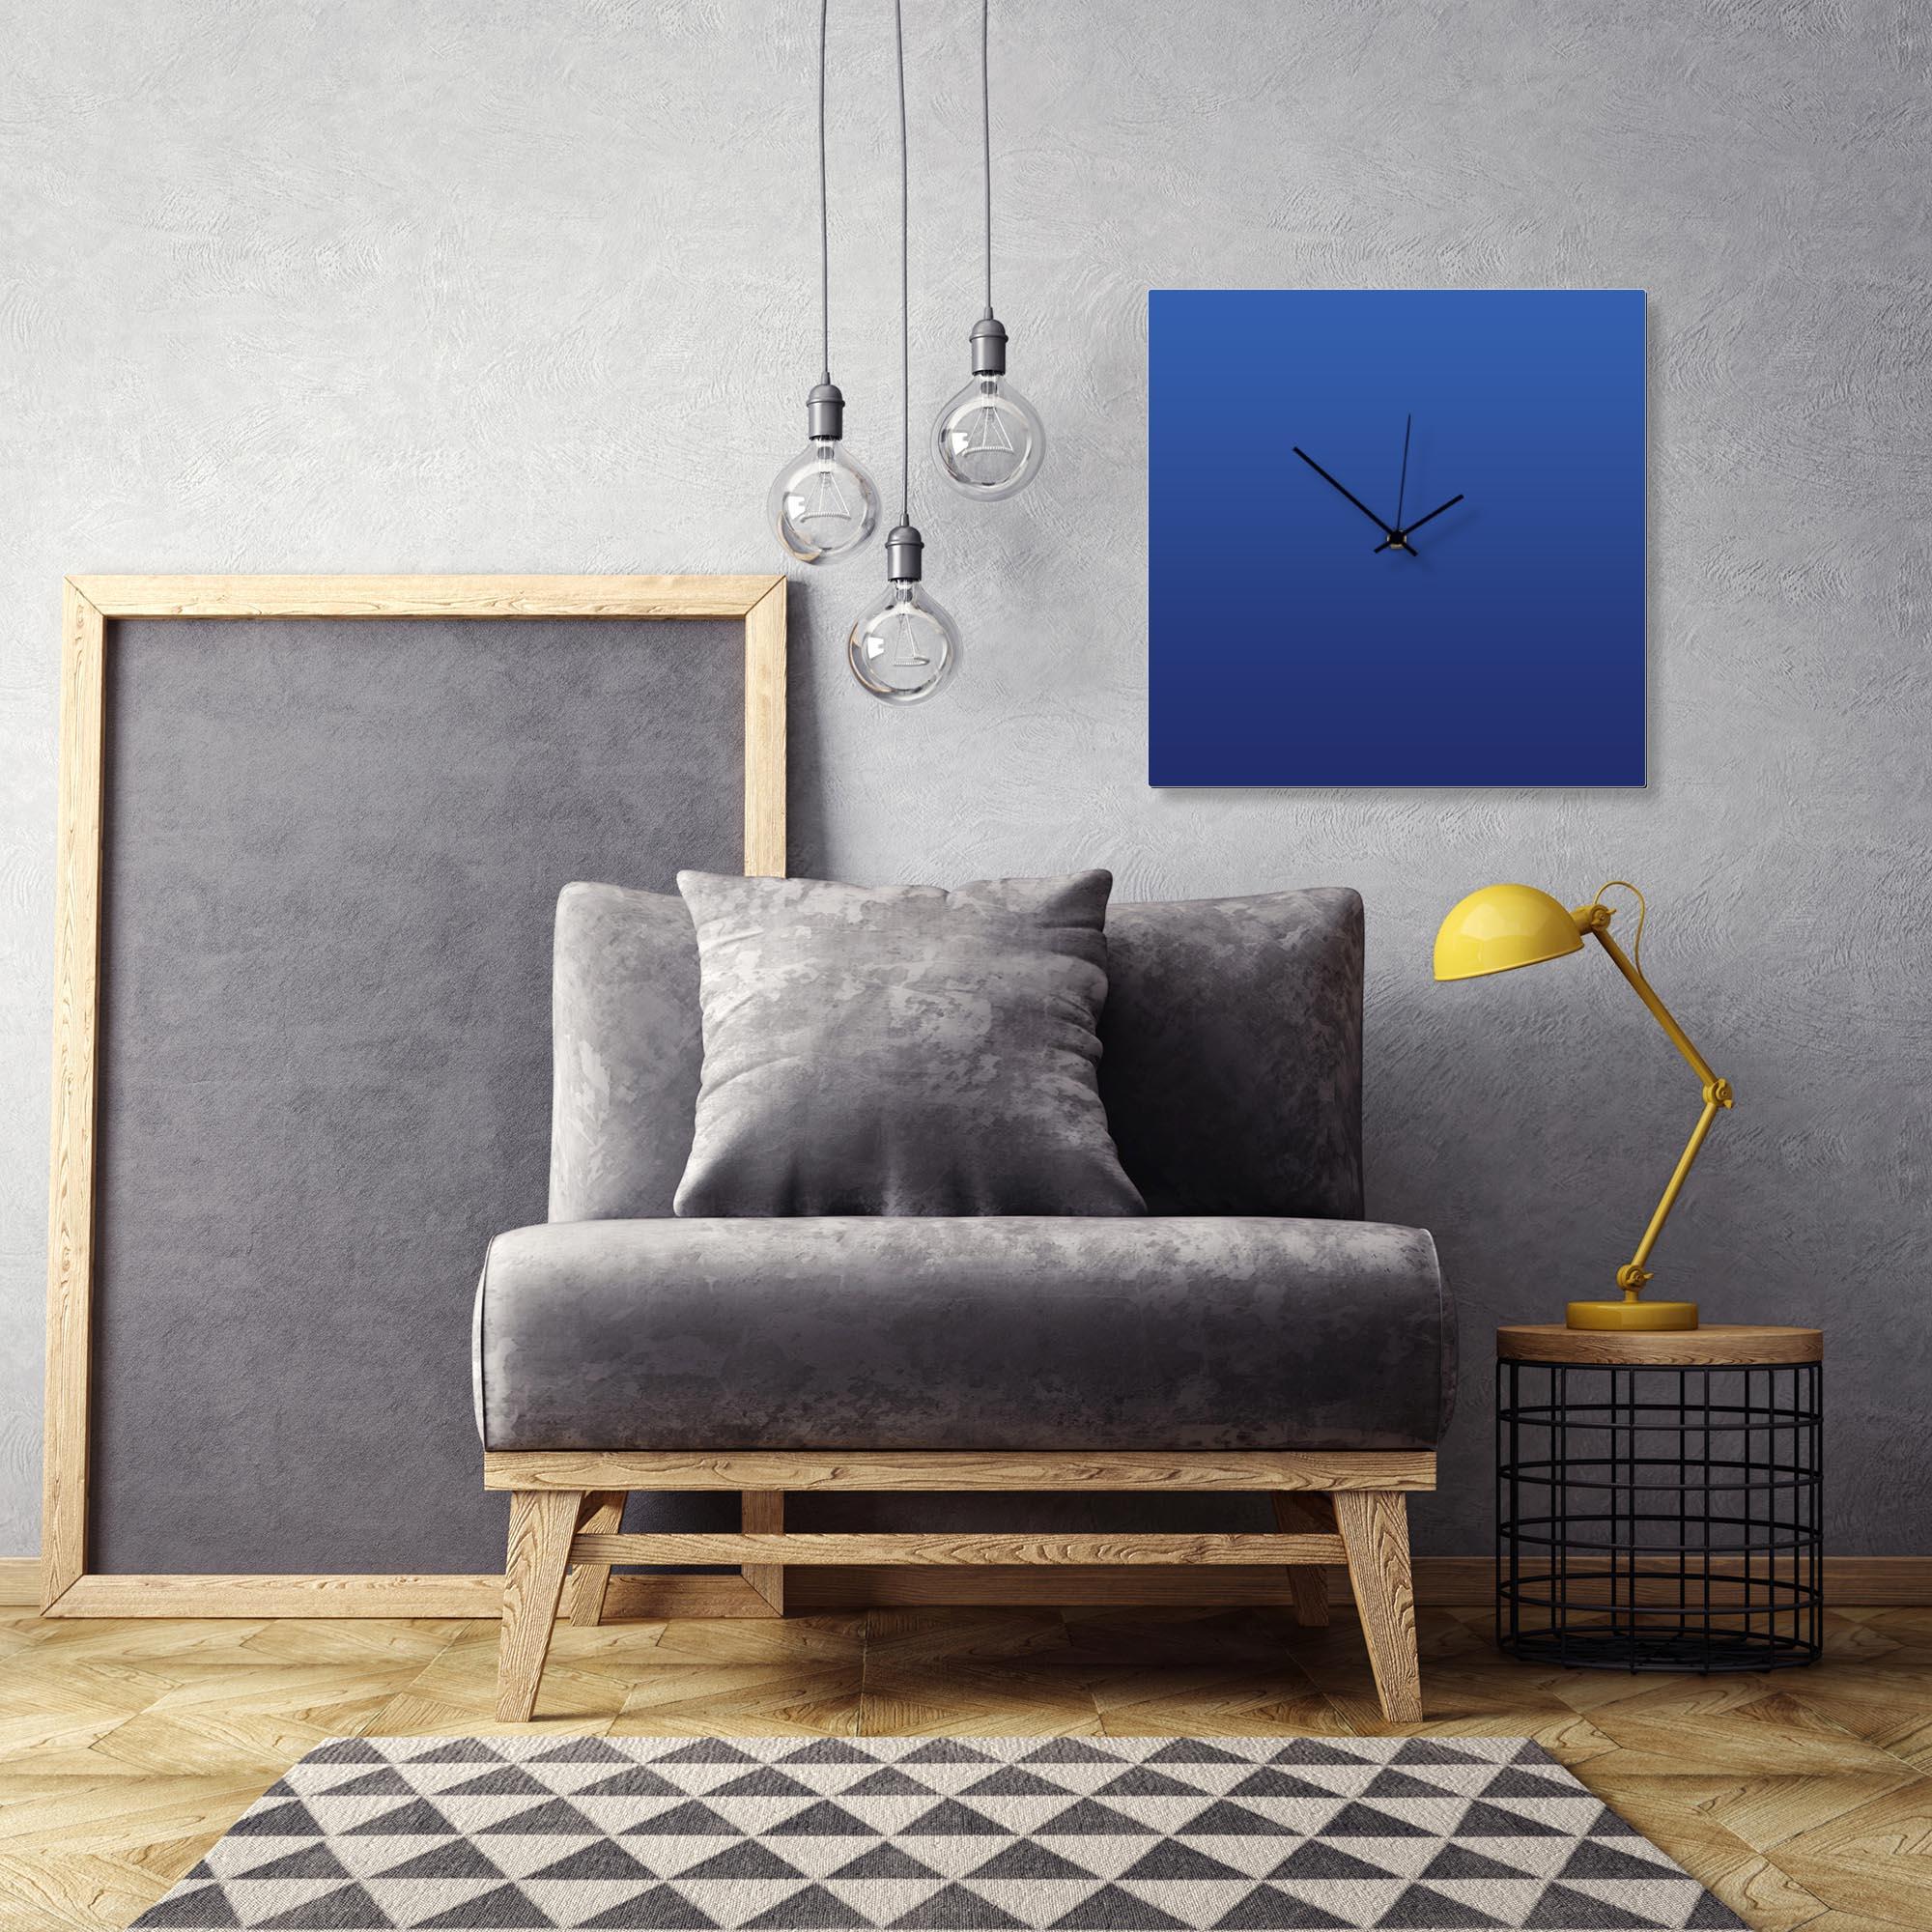 Blueout Black Square Clock Large by Adam Schwoeppe Contemporary Clock on Aluminum Polymetal - Alternate View 1